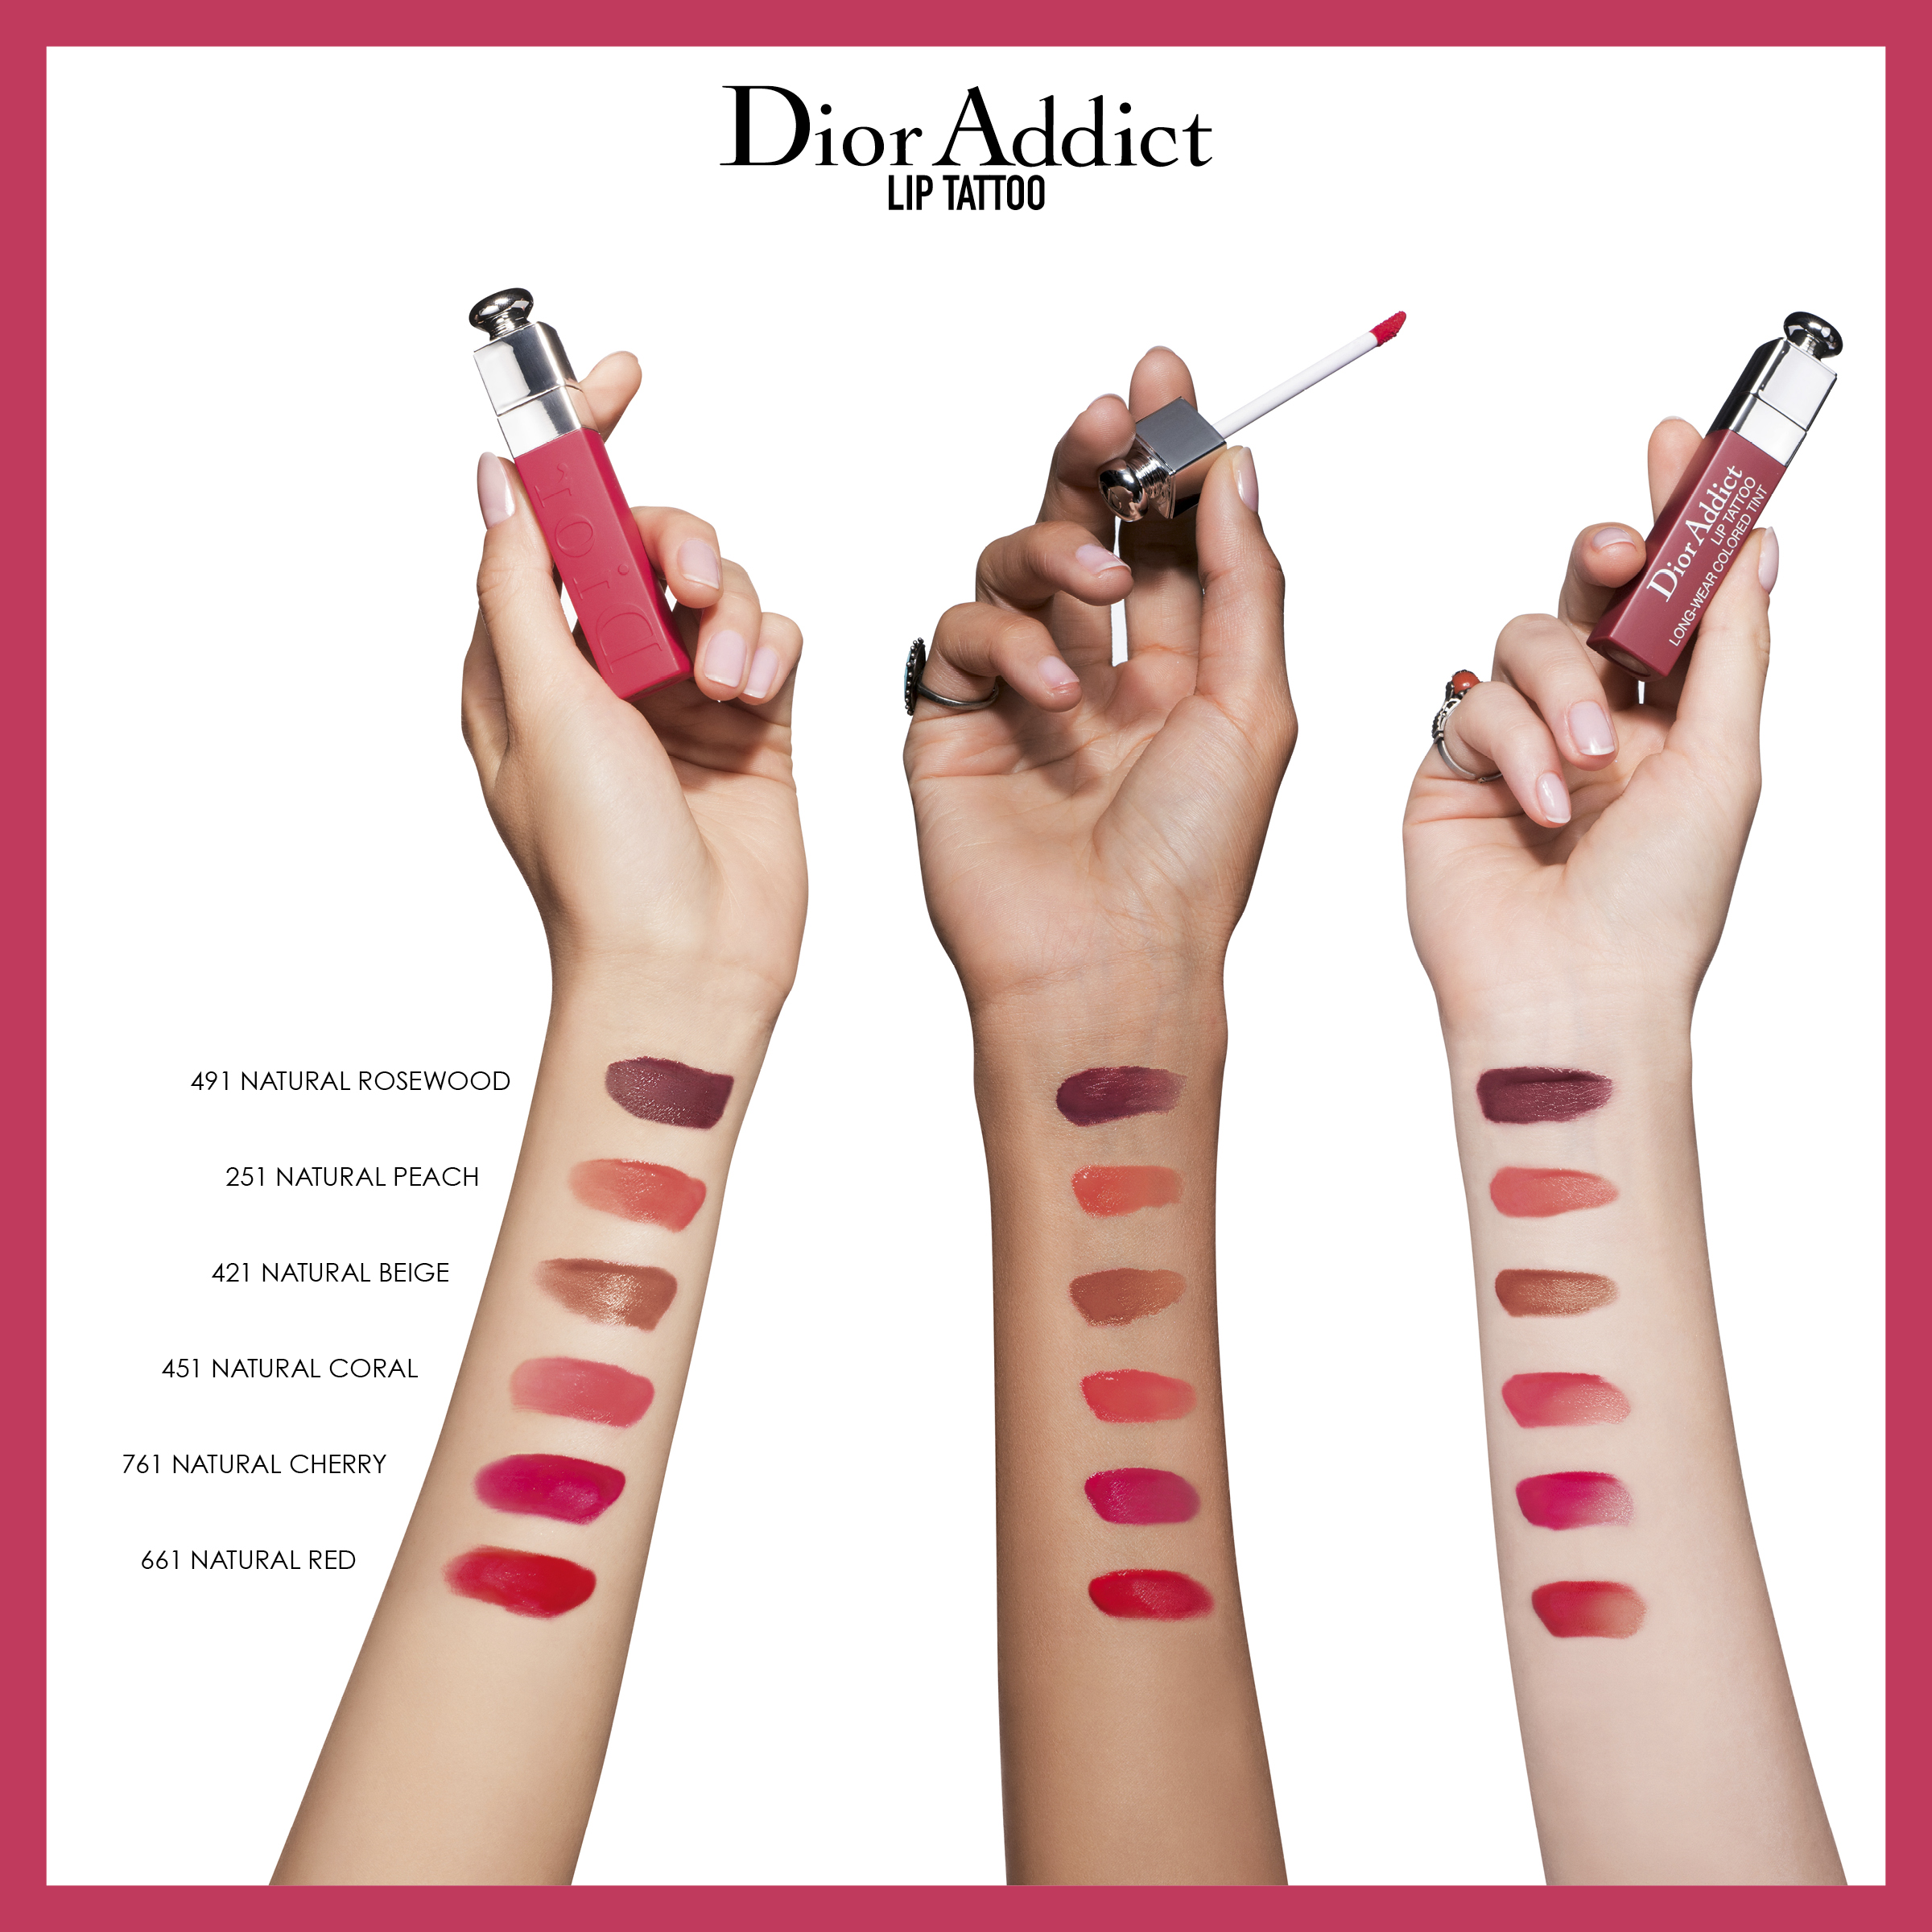 DIOR Addict Lip Tattoo, 761 Natural Cherry